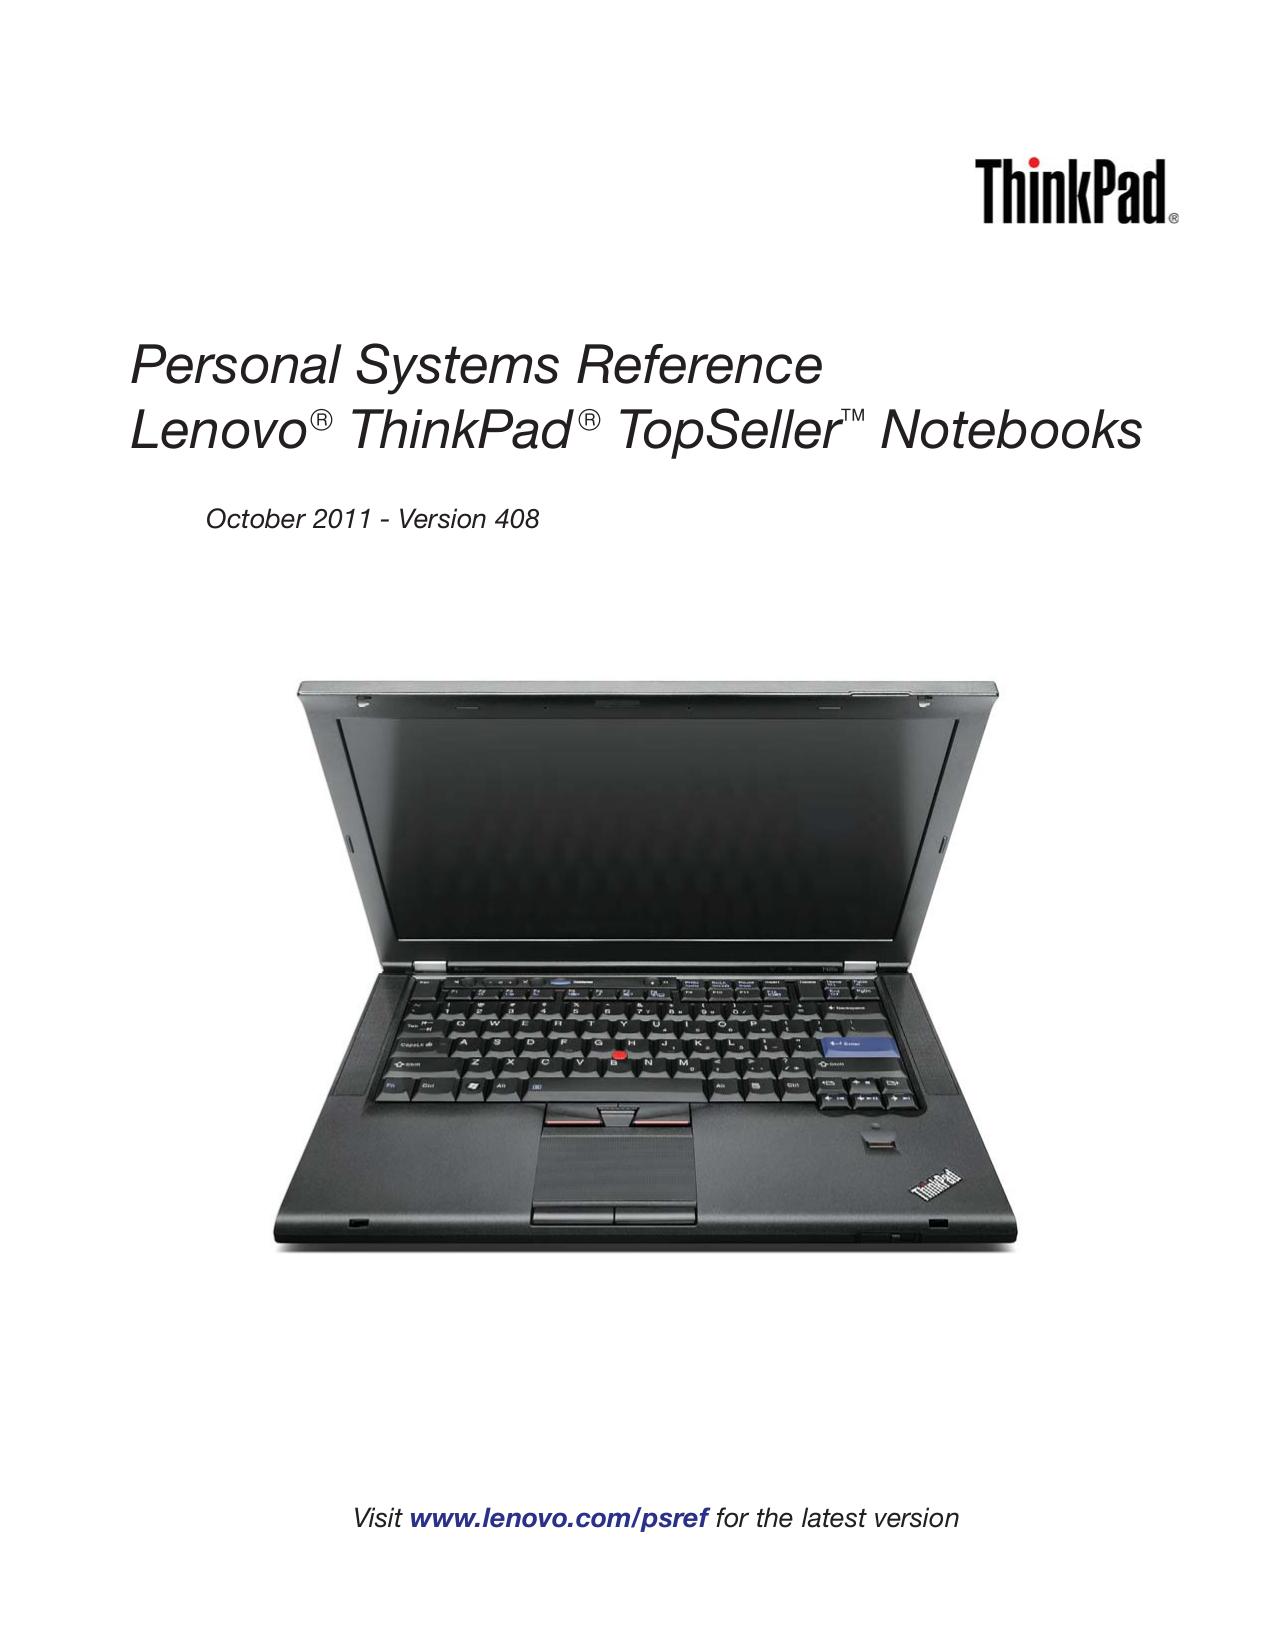 pdf for Lenovo Desktop ThinkCentre M70e 0843 manual